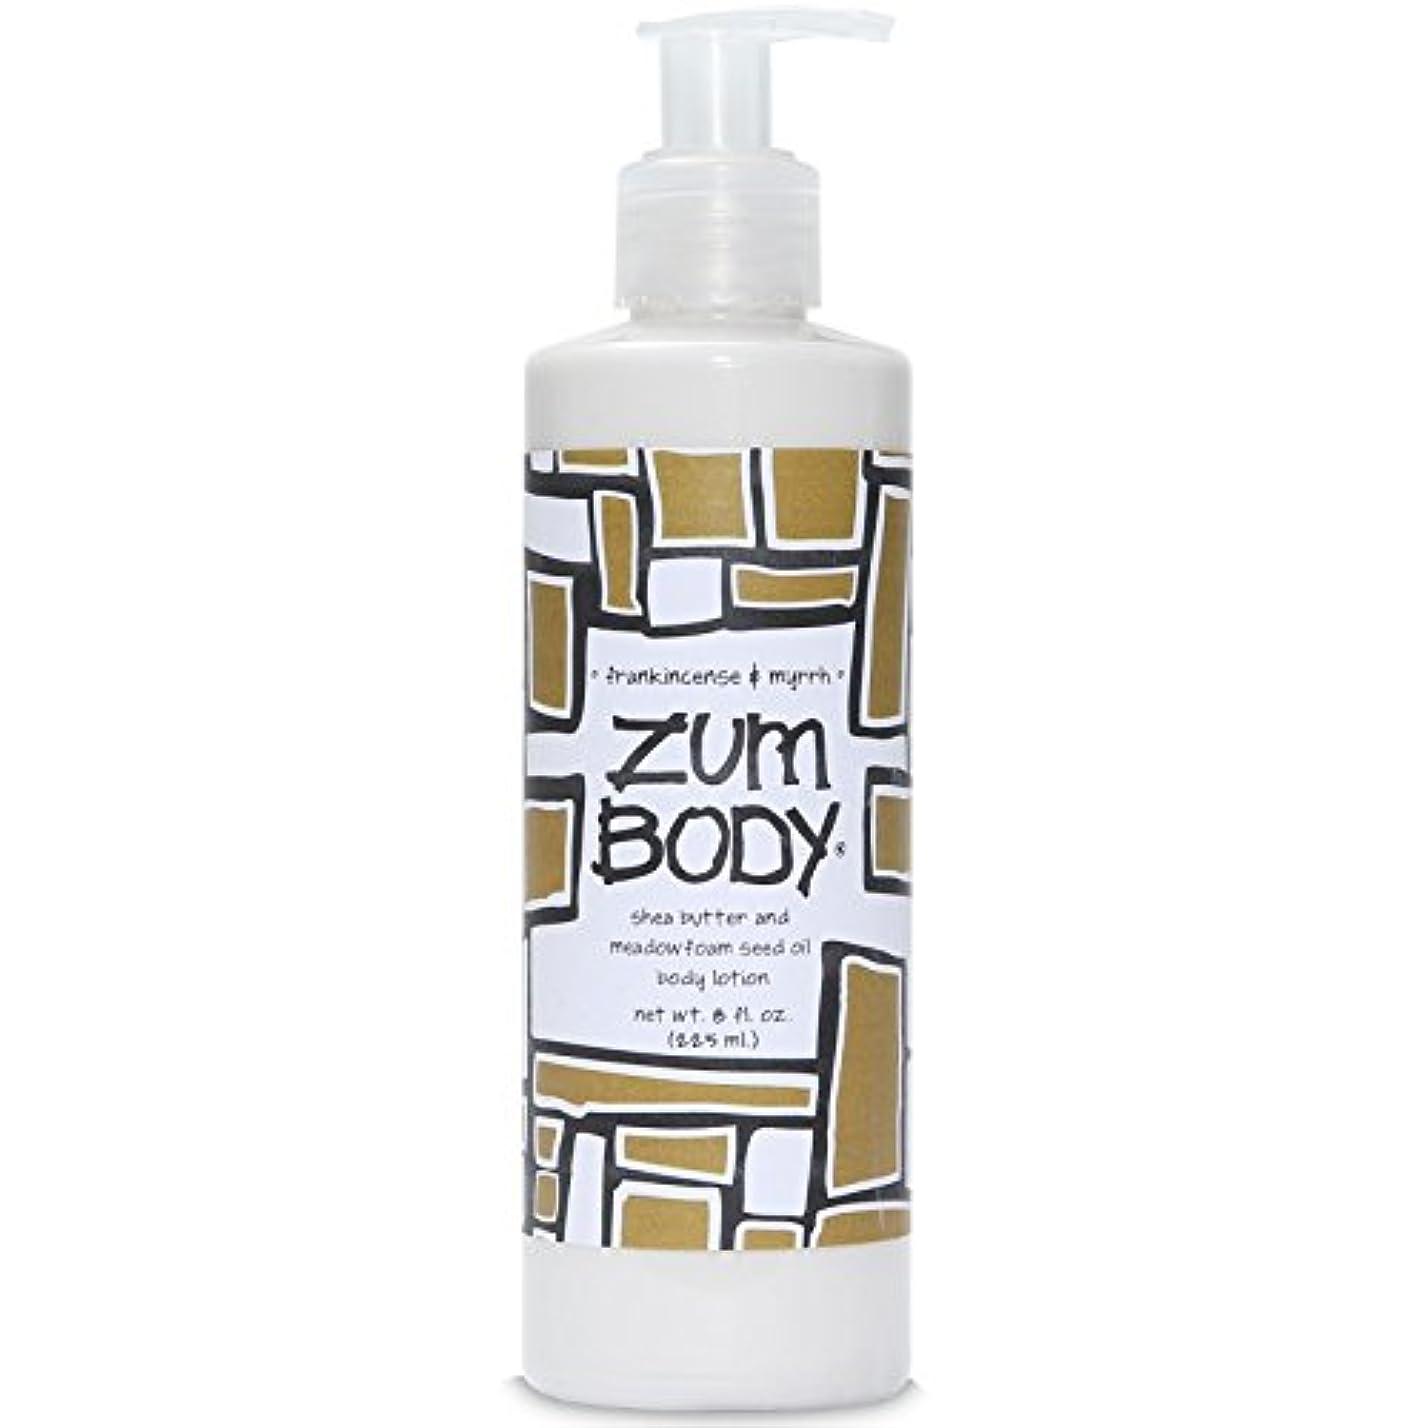 【Zum Body】 シアバター&メドウフォームシードオイル配合ボディークリーム(フランキンセンス&ミルラの香り)225ml, Shea Butter & Meadow Foam Seed Oil Body Lotion...